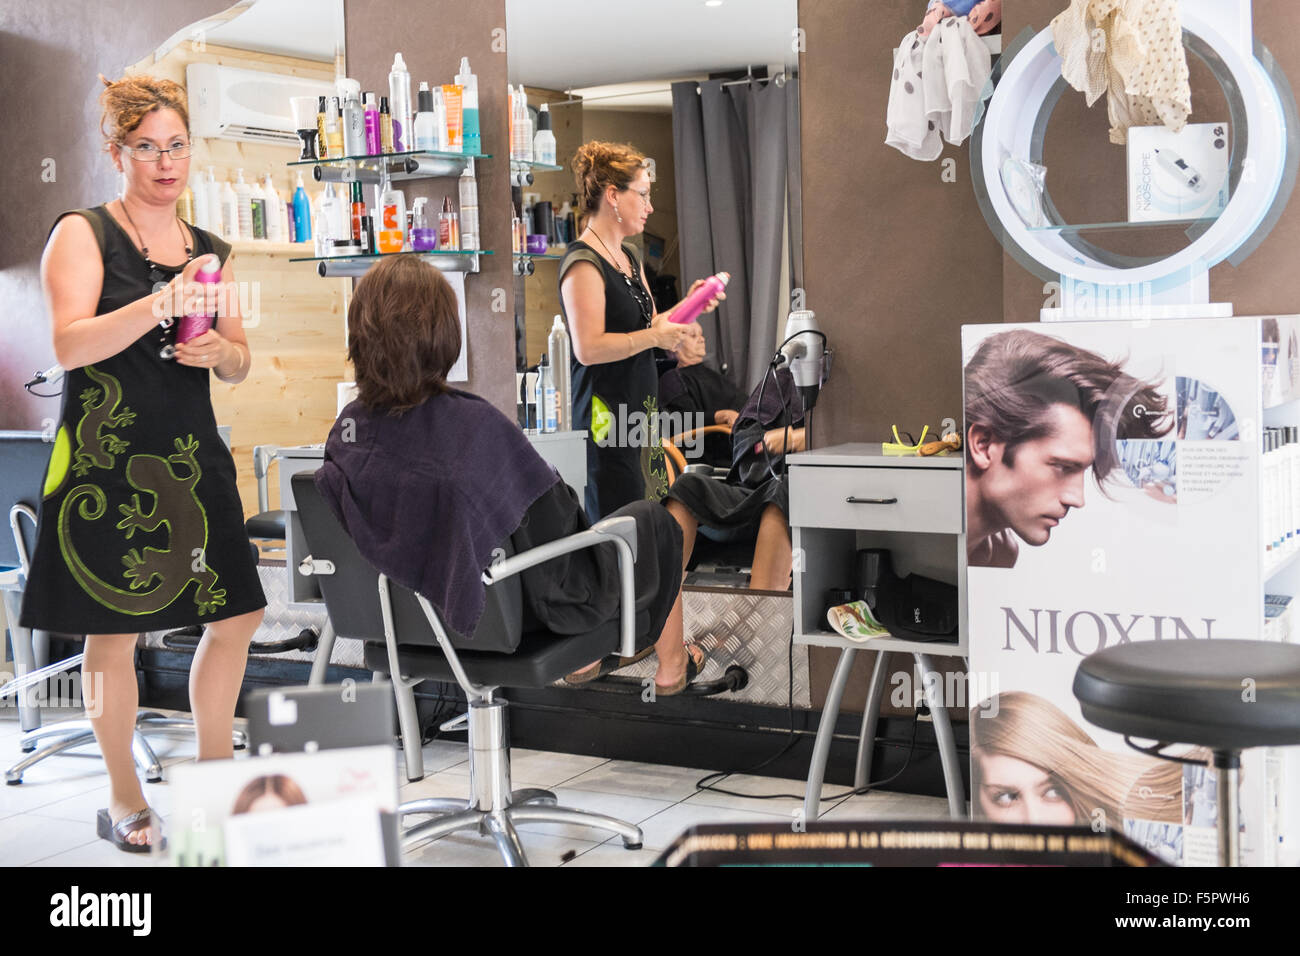 hairdresser,salon,barber,Couiza,Aude,France,style, - Stock Image